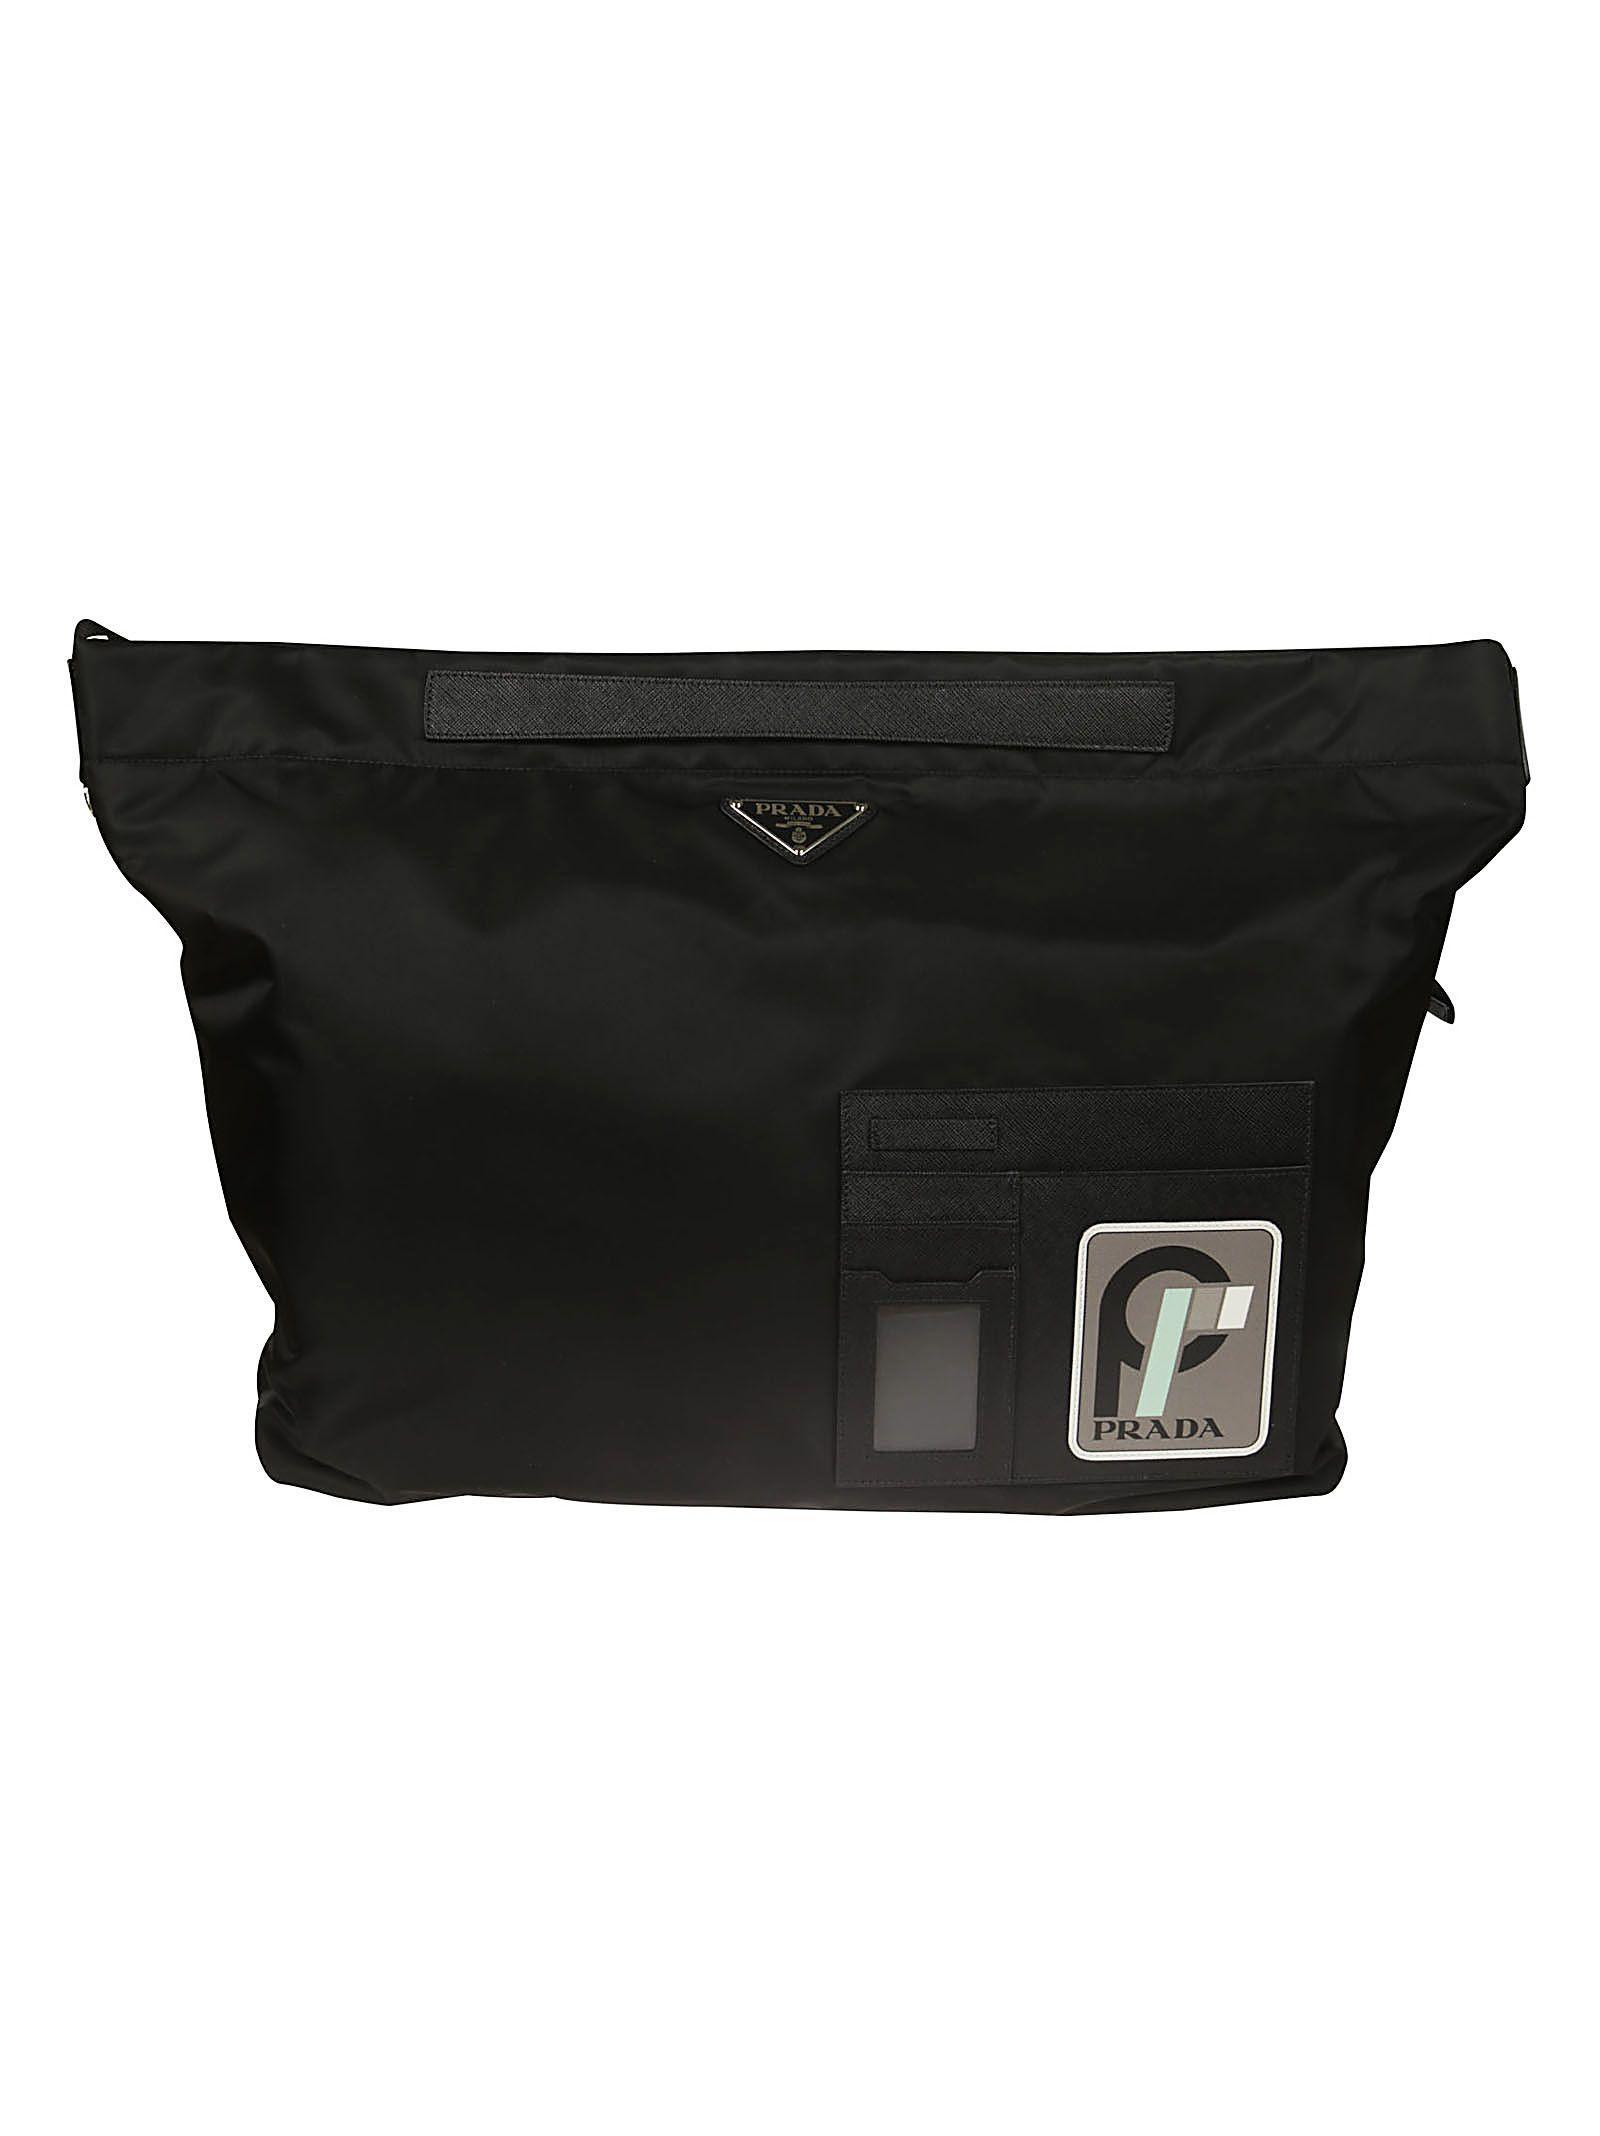 Prada Technical Fabric Shoulder Bag